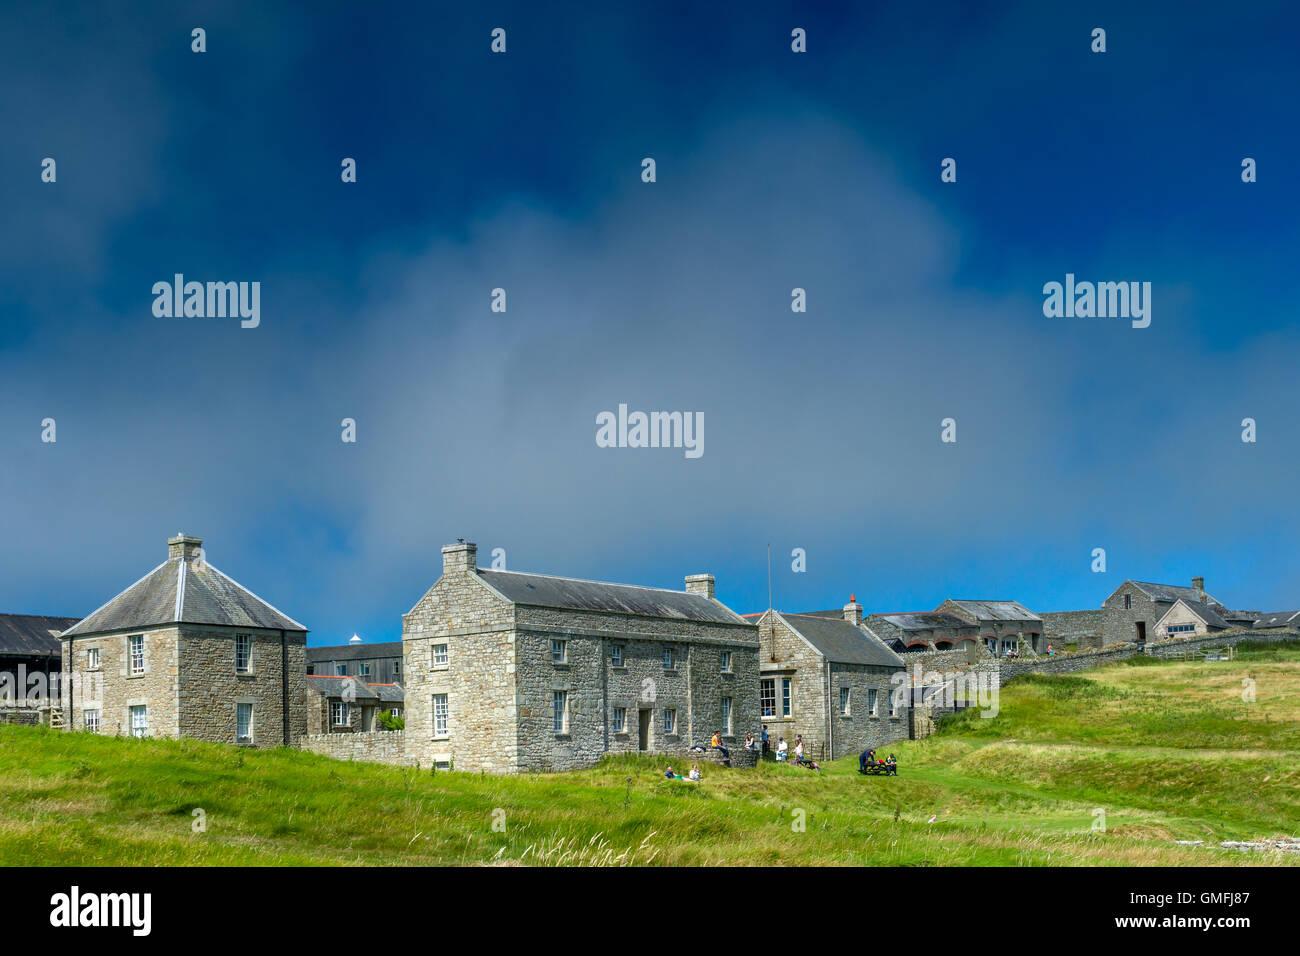 Lundy Island - Stock Image